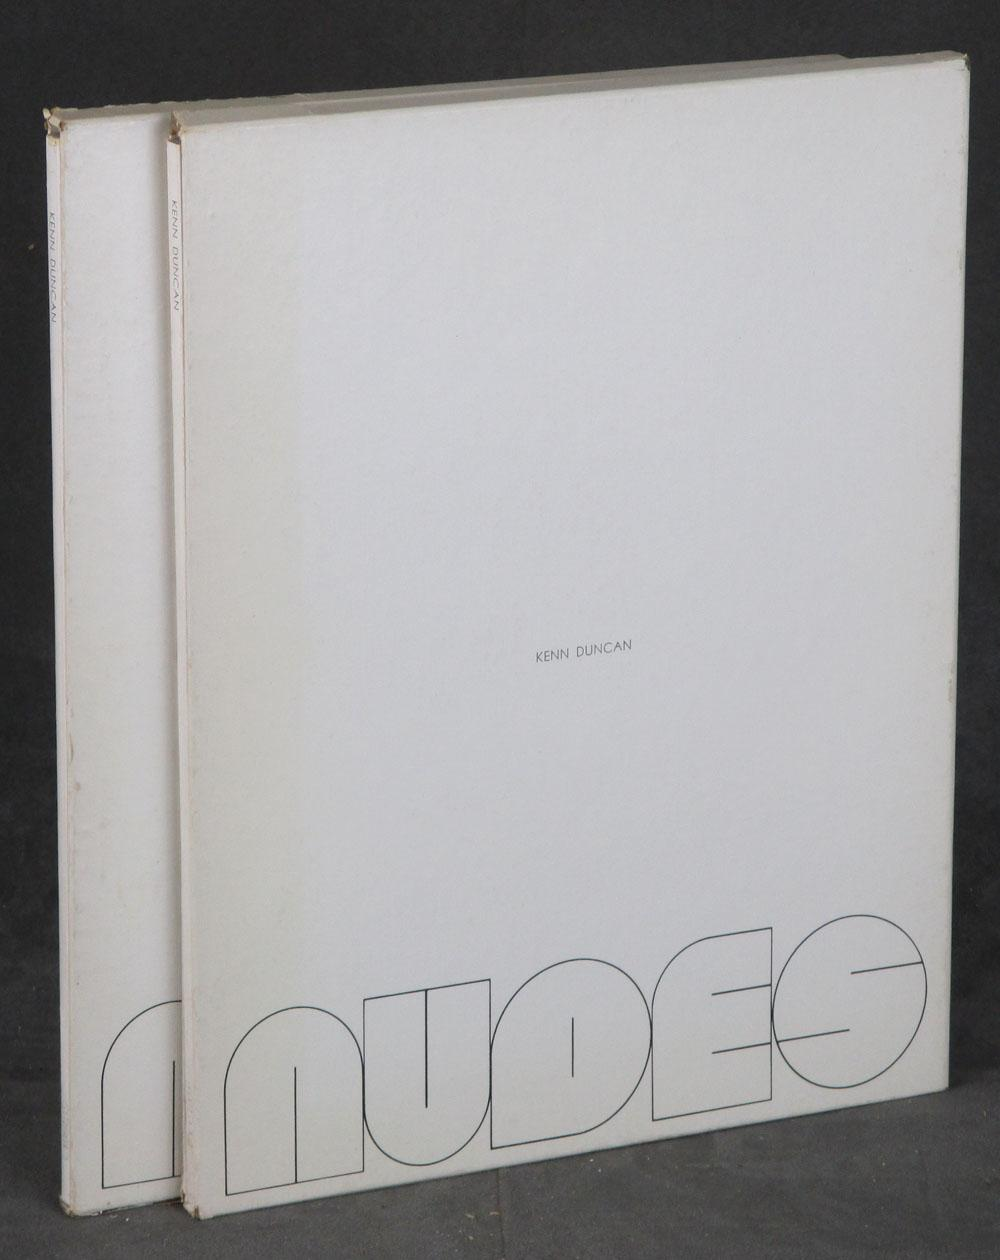 Nudes & More Nudes (2 Vols.) Kenn Duncan